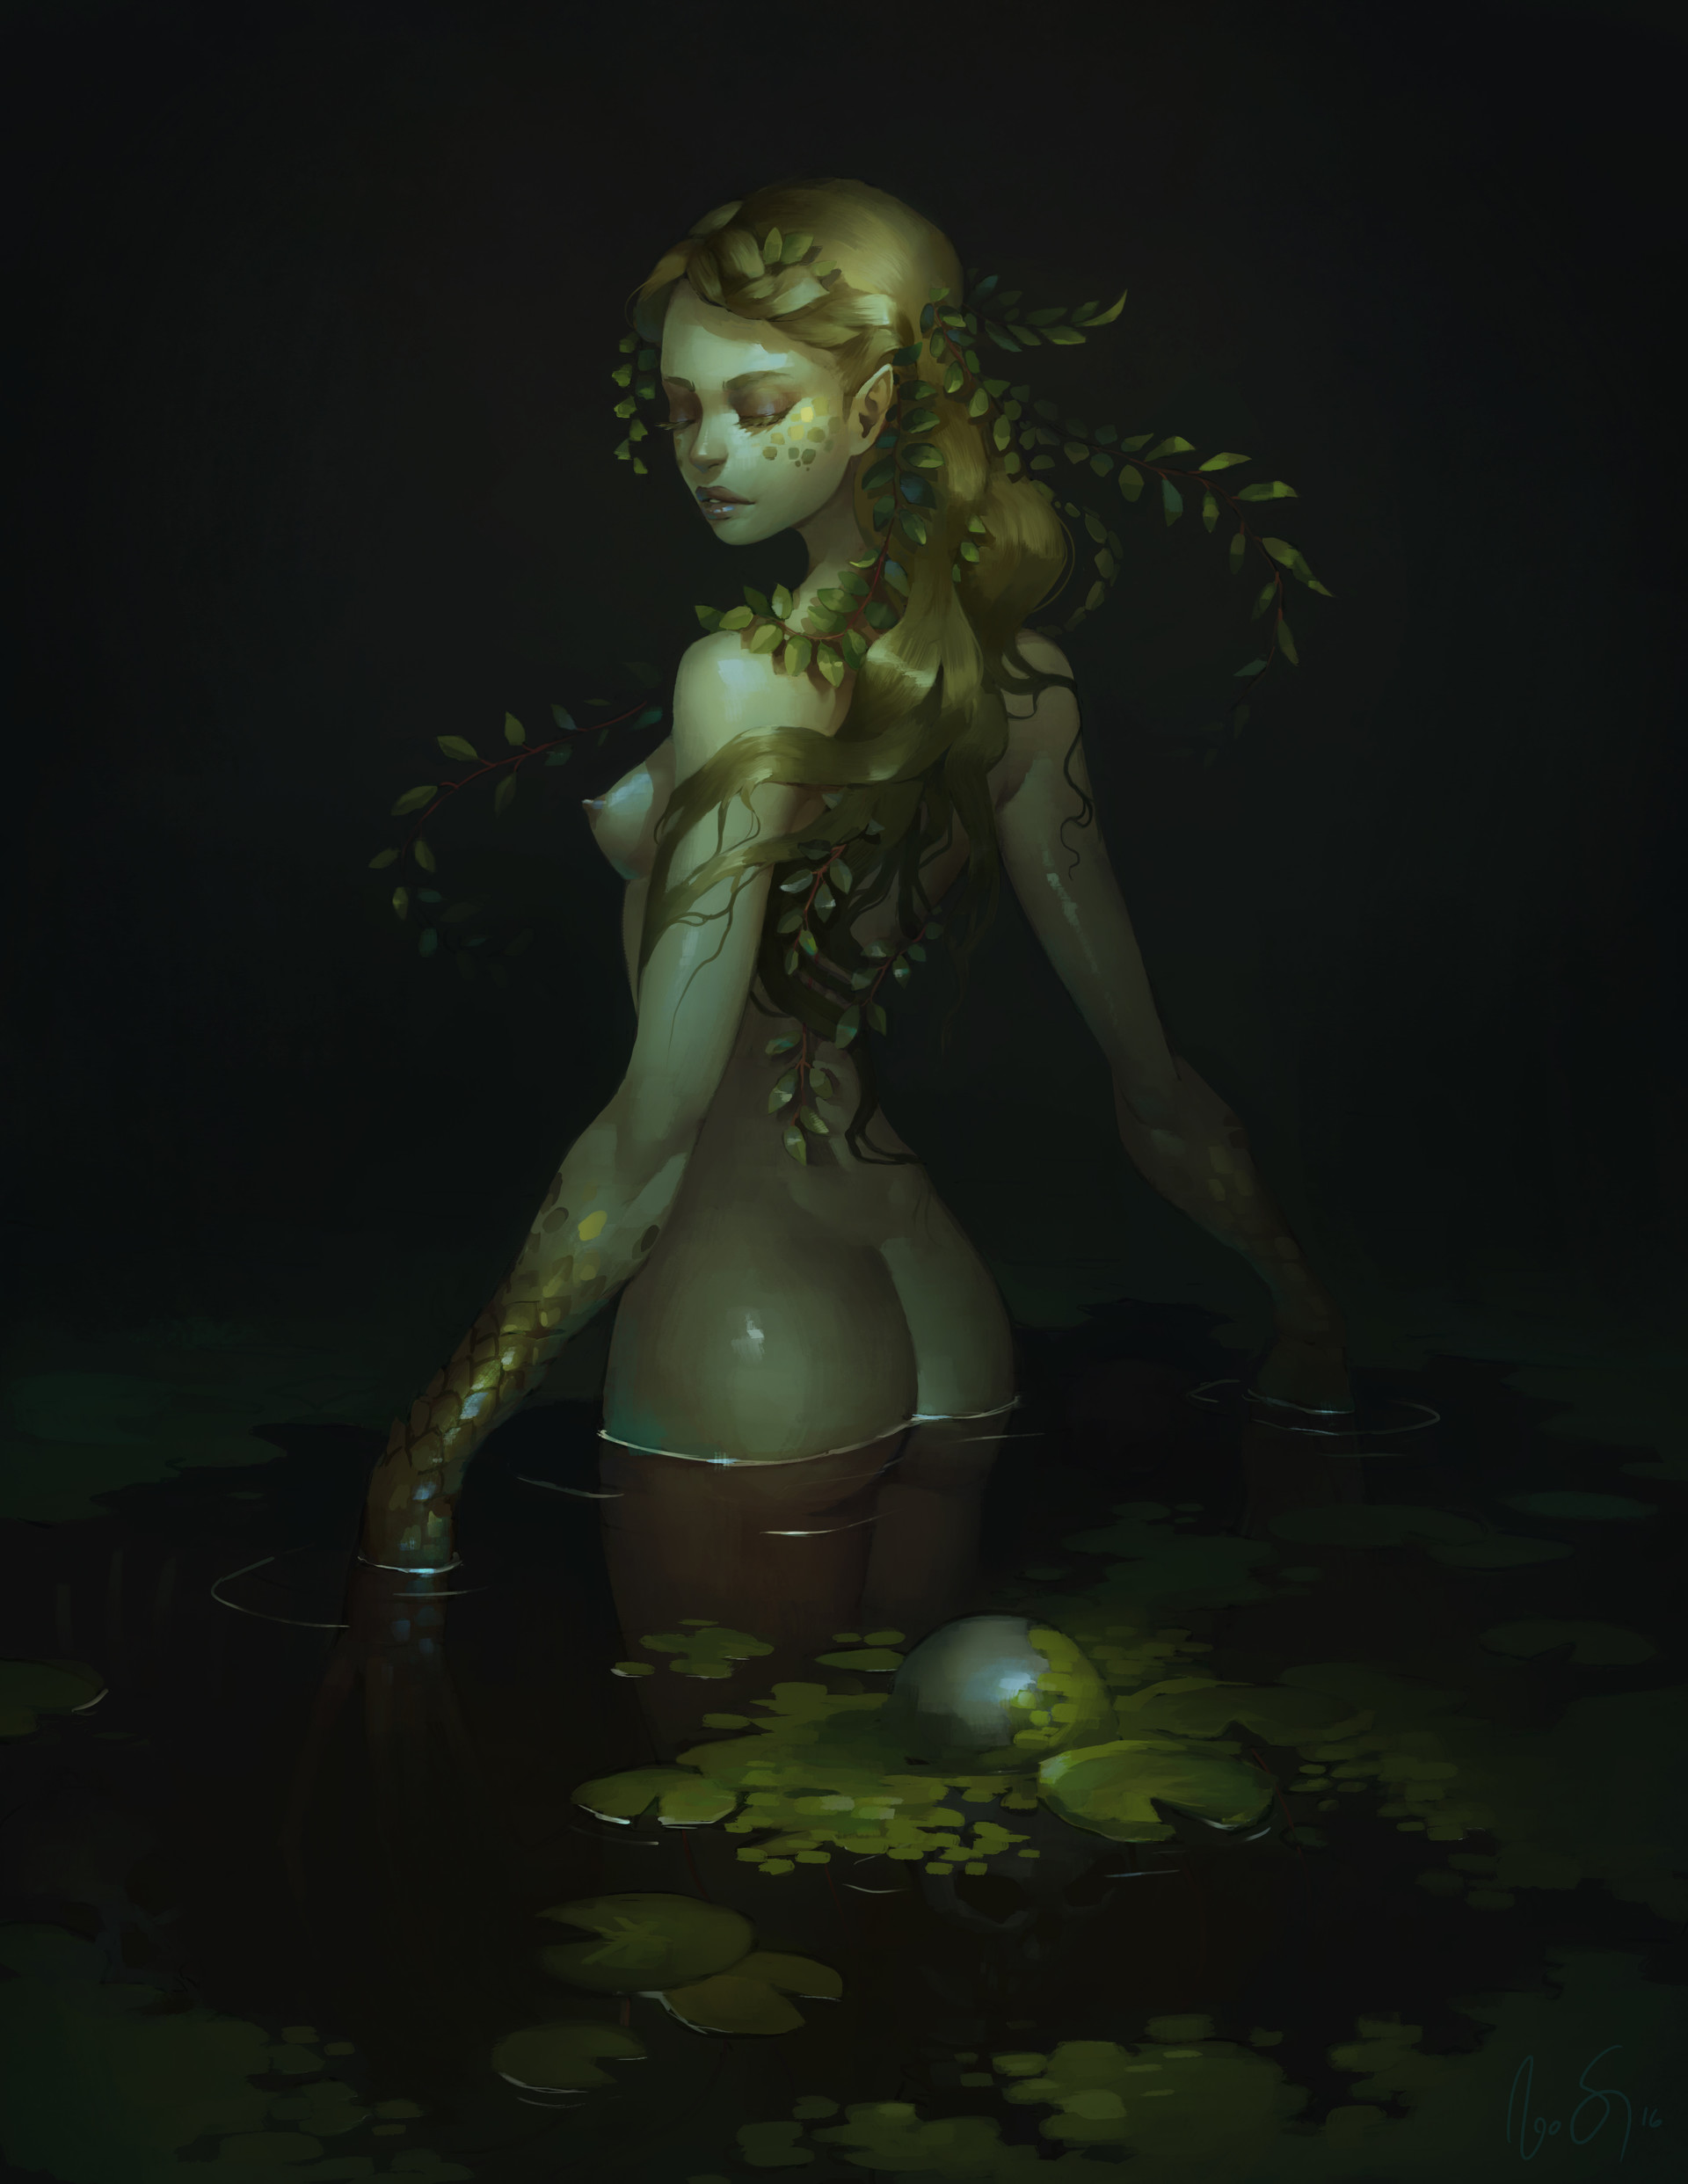 Naomi savoie lady of the swamp